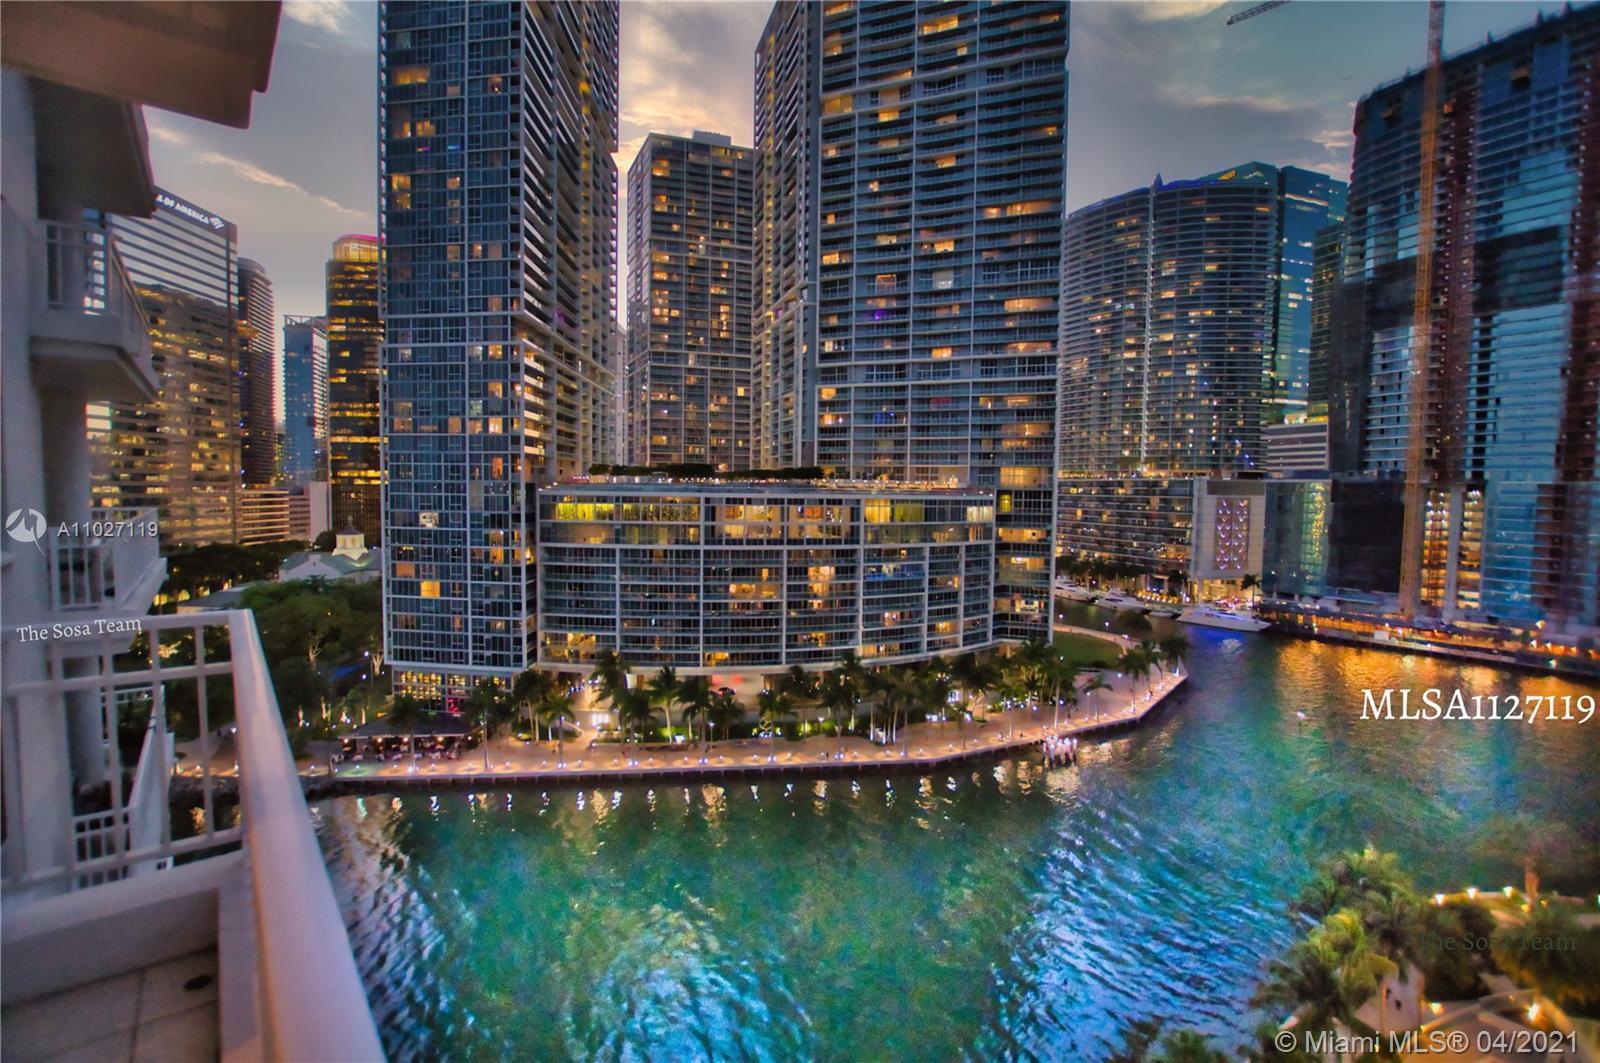 Courts Brickell Key #1504 - 801 Brickell Key Blvd #1504, Miami, FL 33131